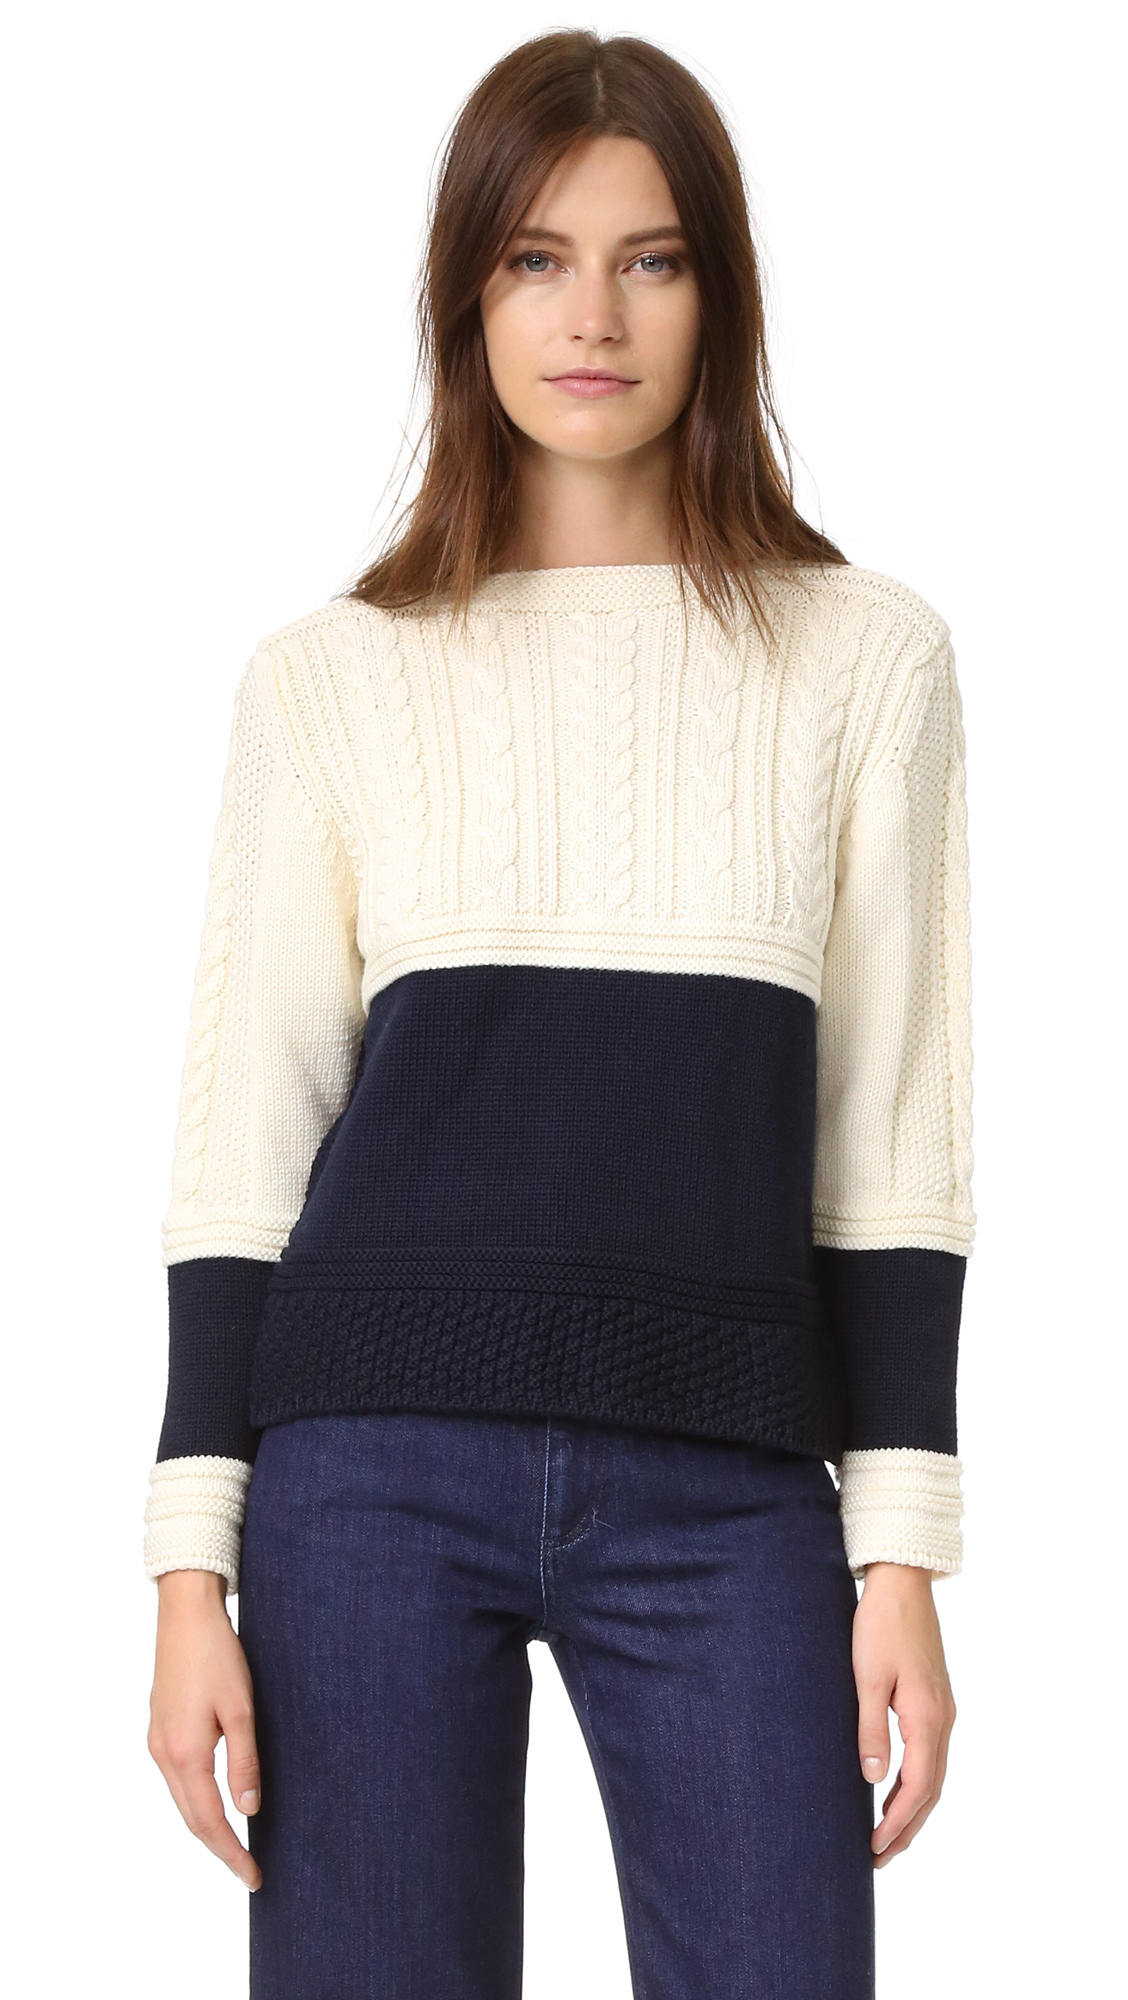 &Daughter Cropped Guernsey Sweater - Ecru/Navy at Shopbop